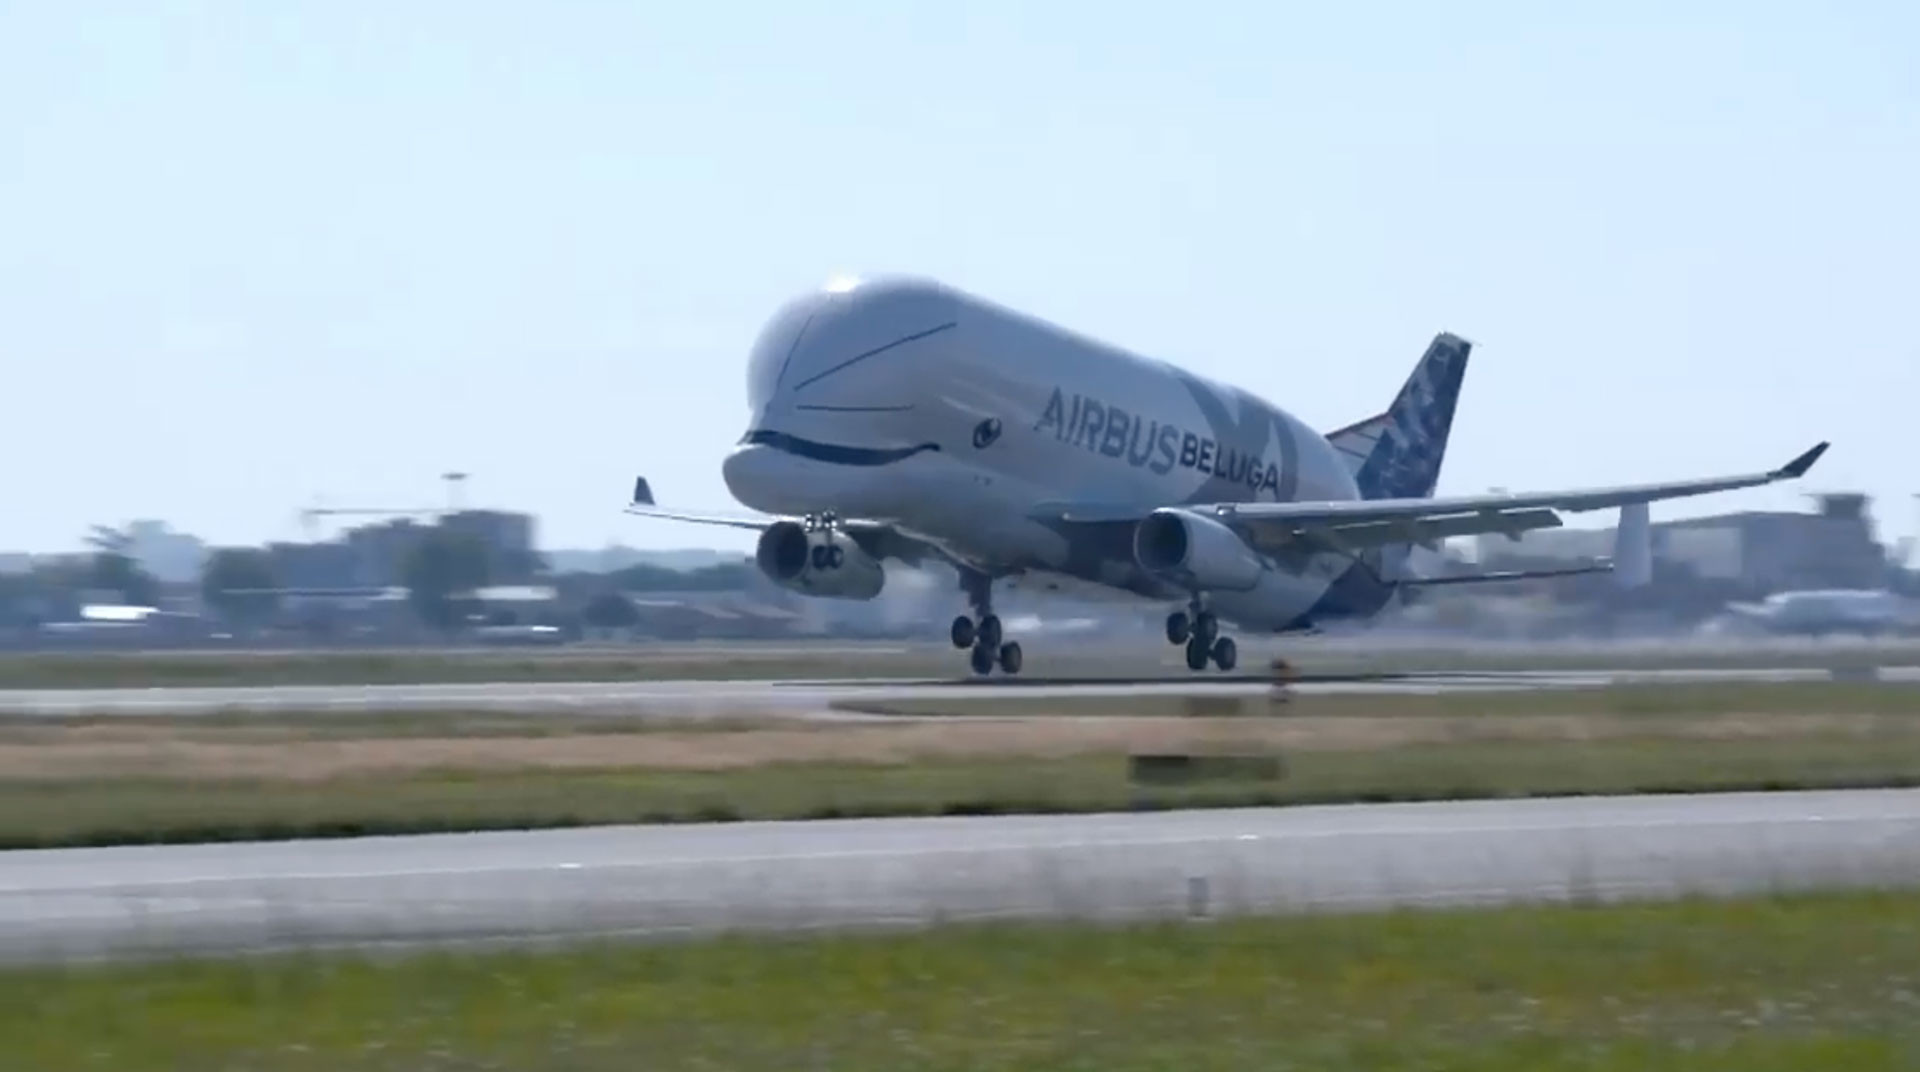 "<p>Фото: &copy; <a href=""https://www.facebook.com/airbus/videos/2255854991097439/"" target=""_blank"">facebook.com/Airbus</a></p>"